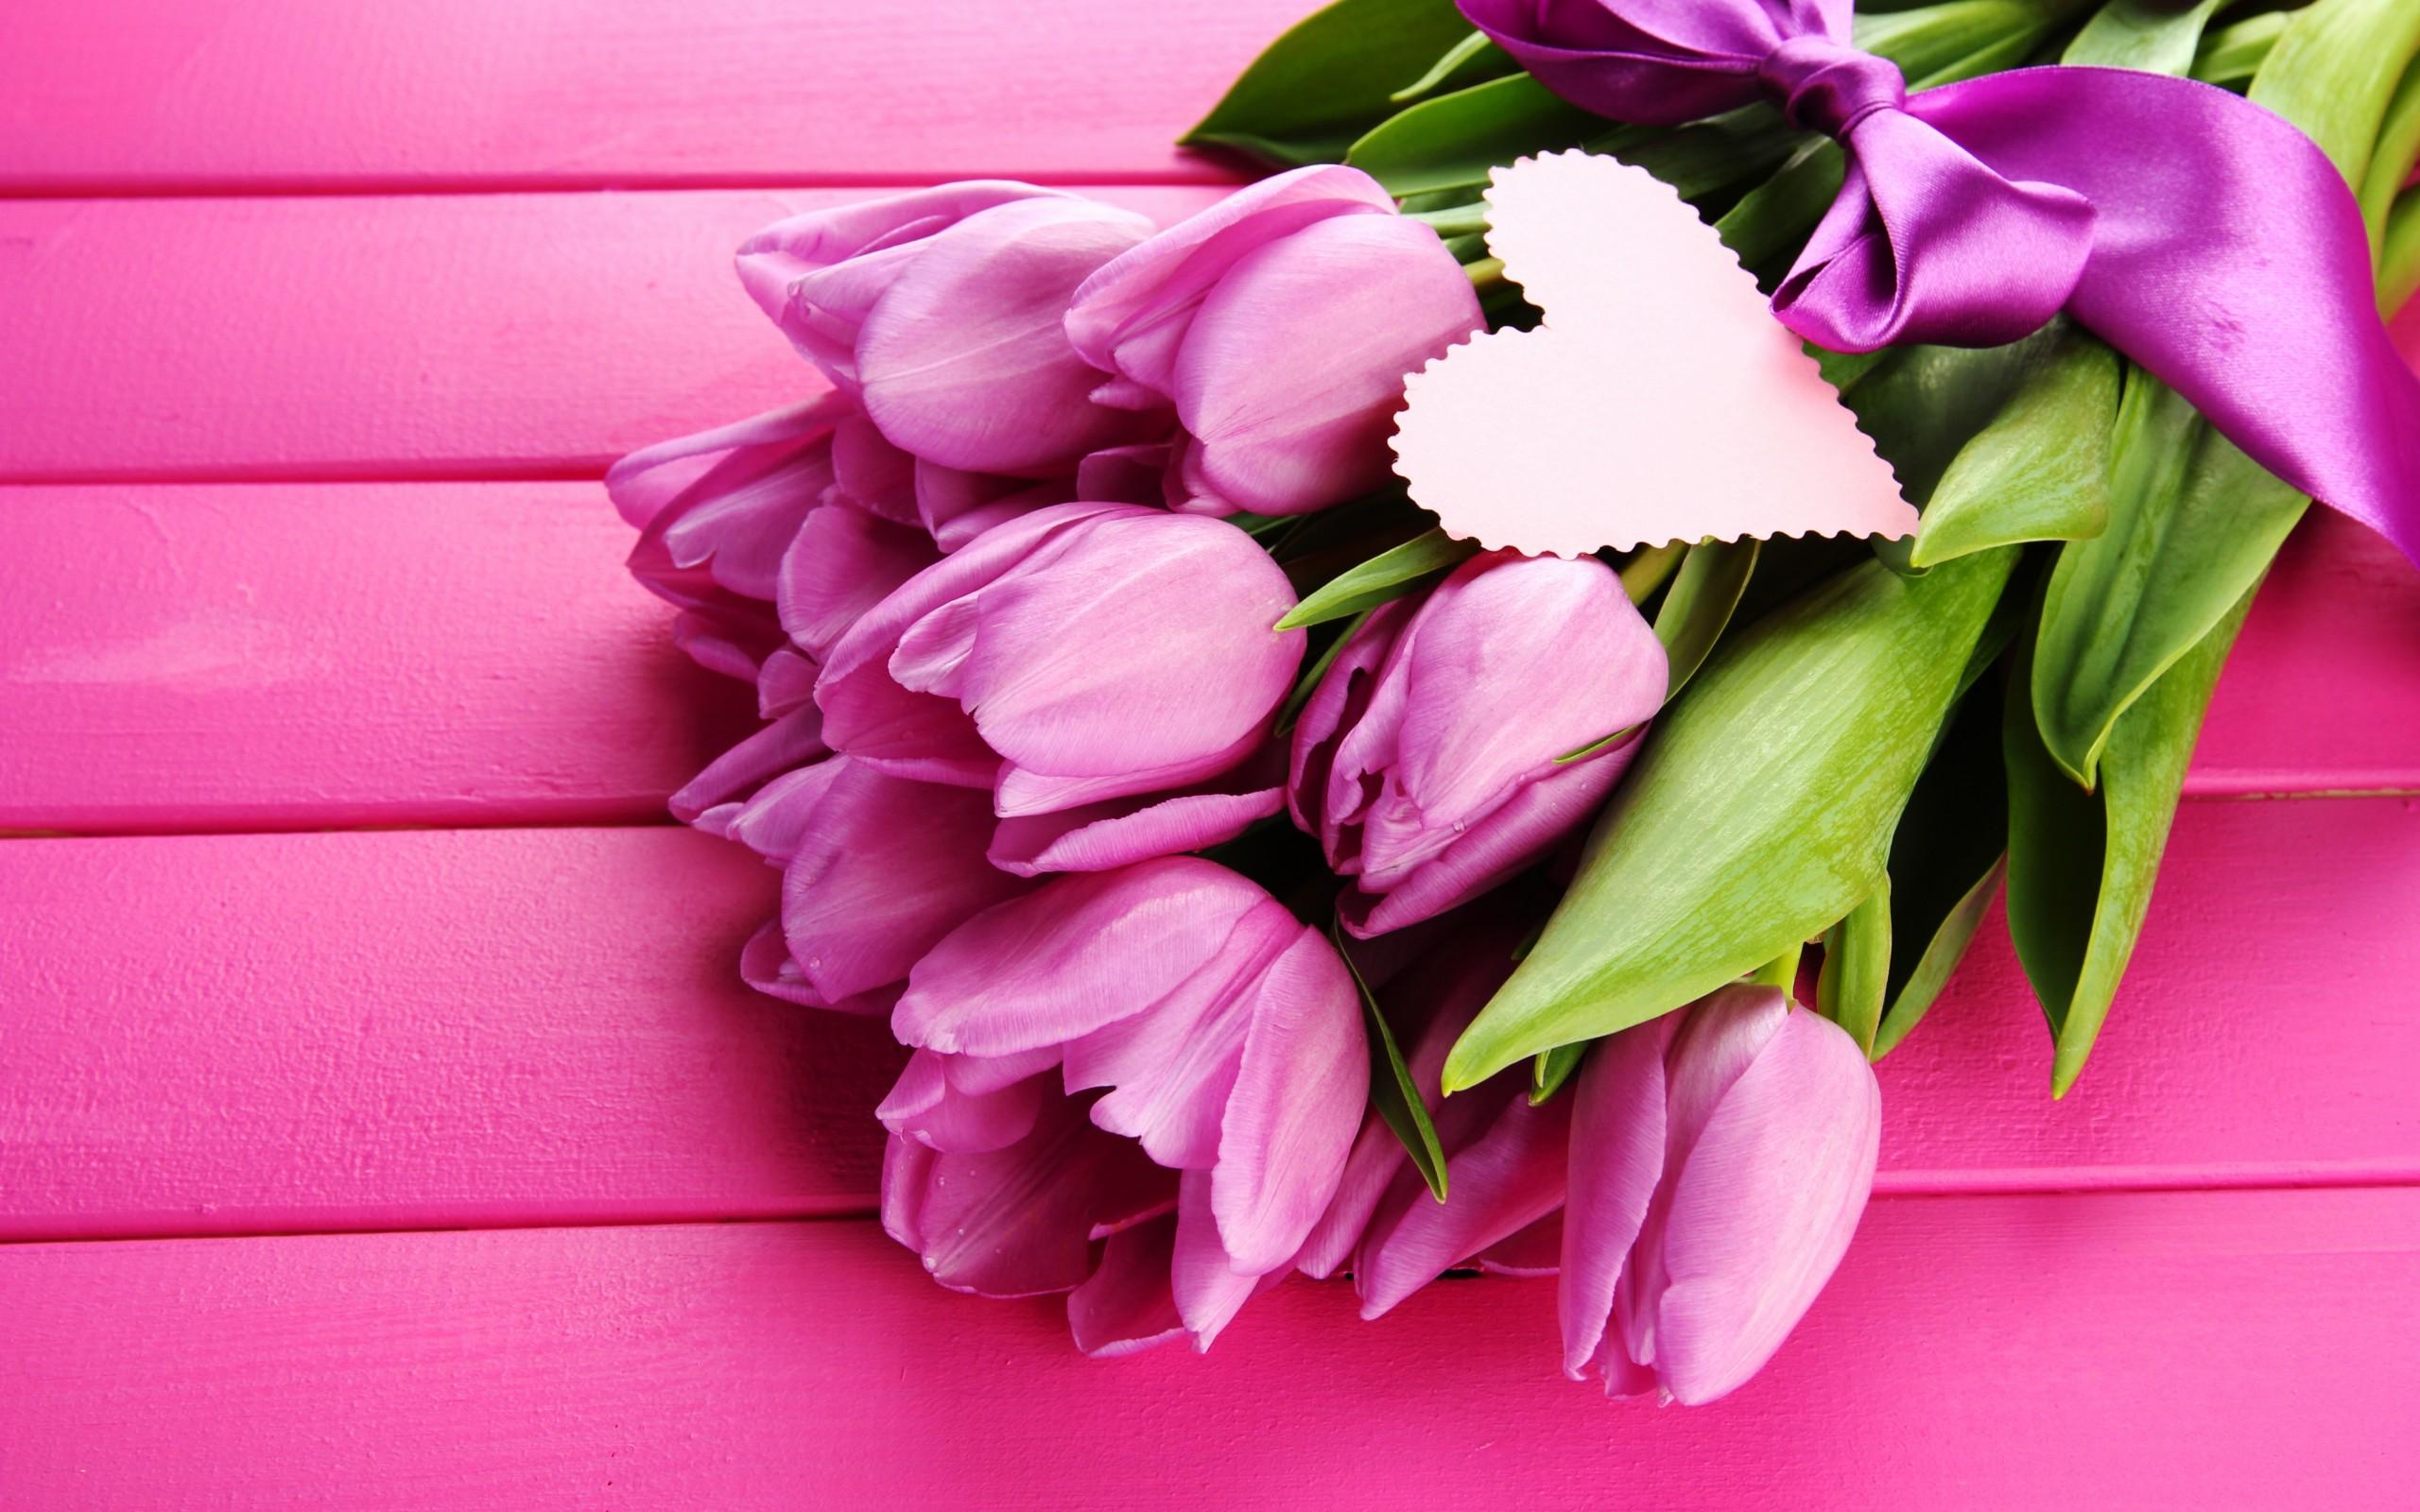 Tulips-flowers-35688216-2560-1600